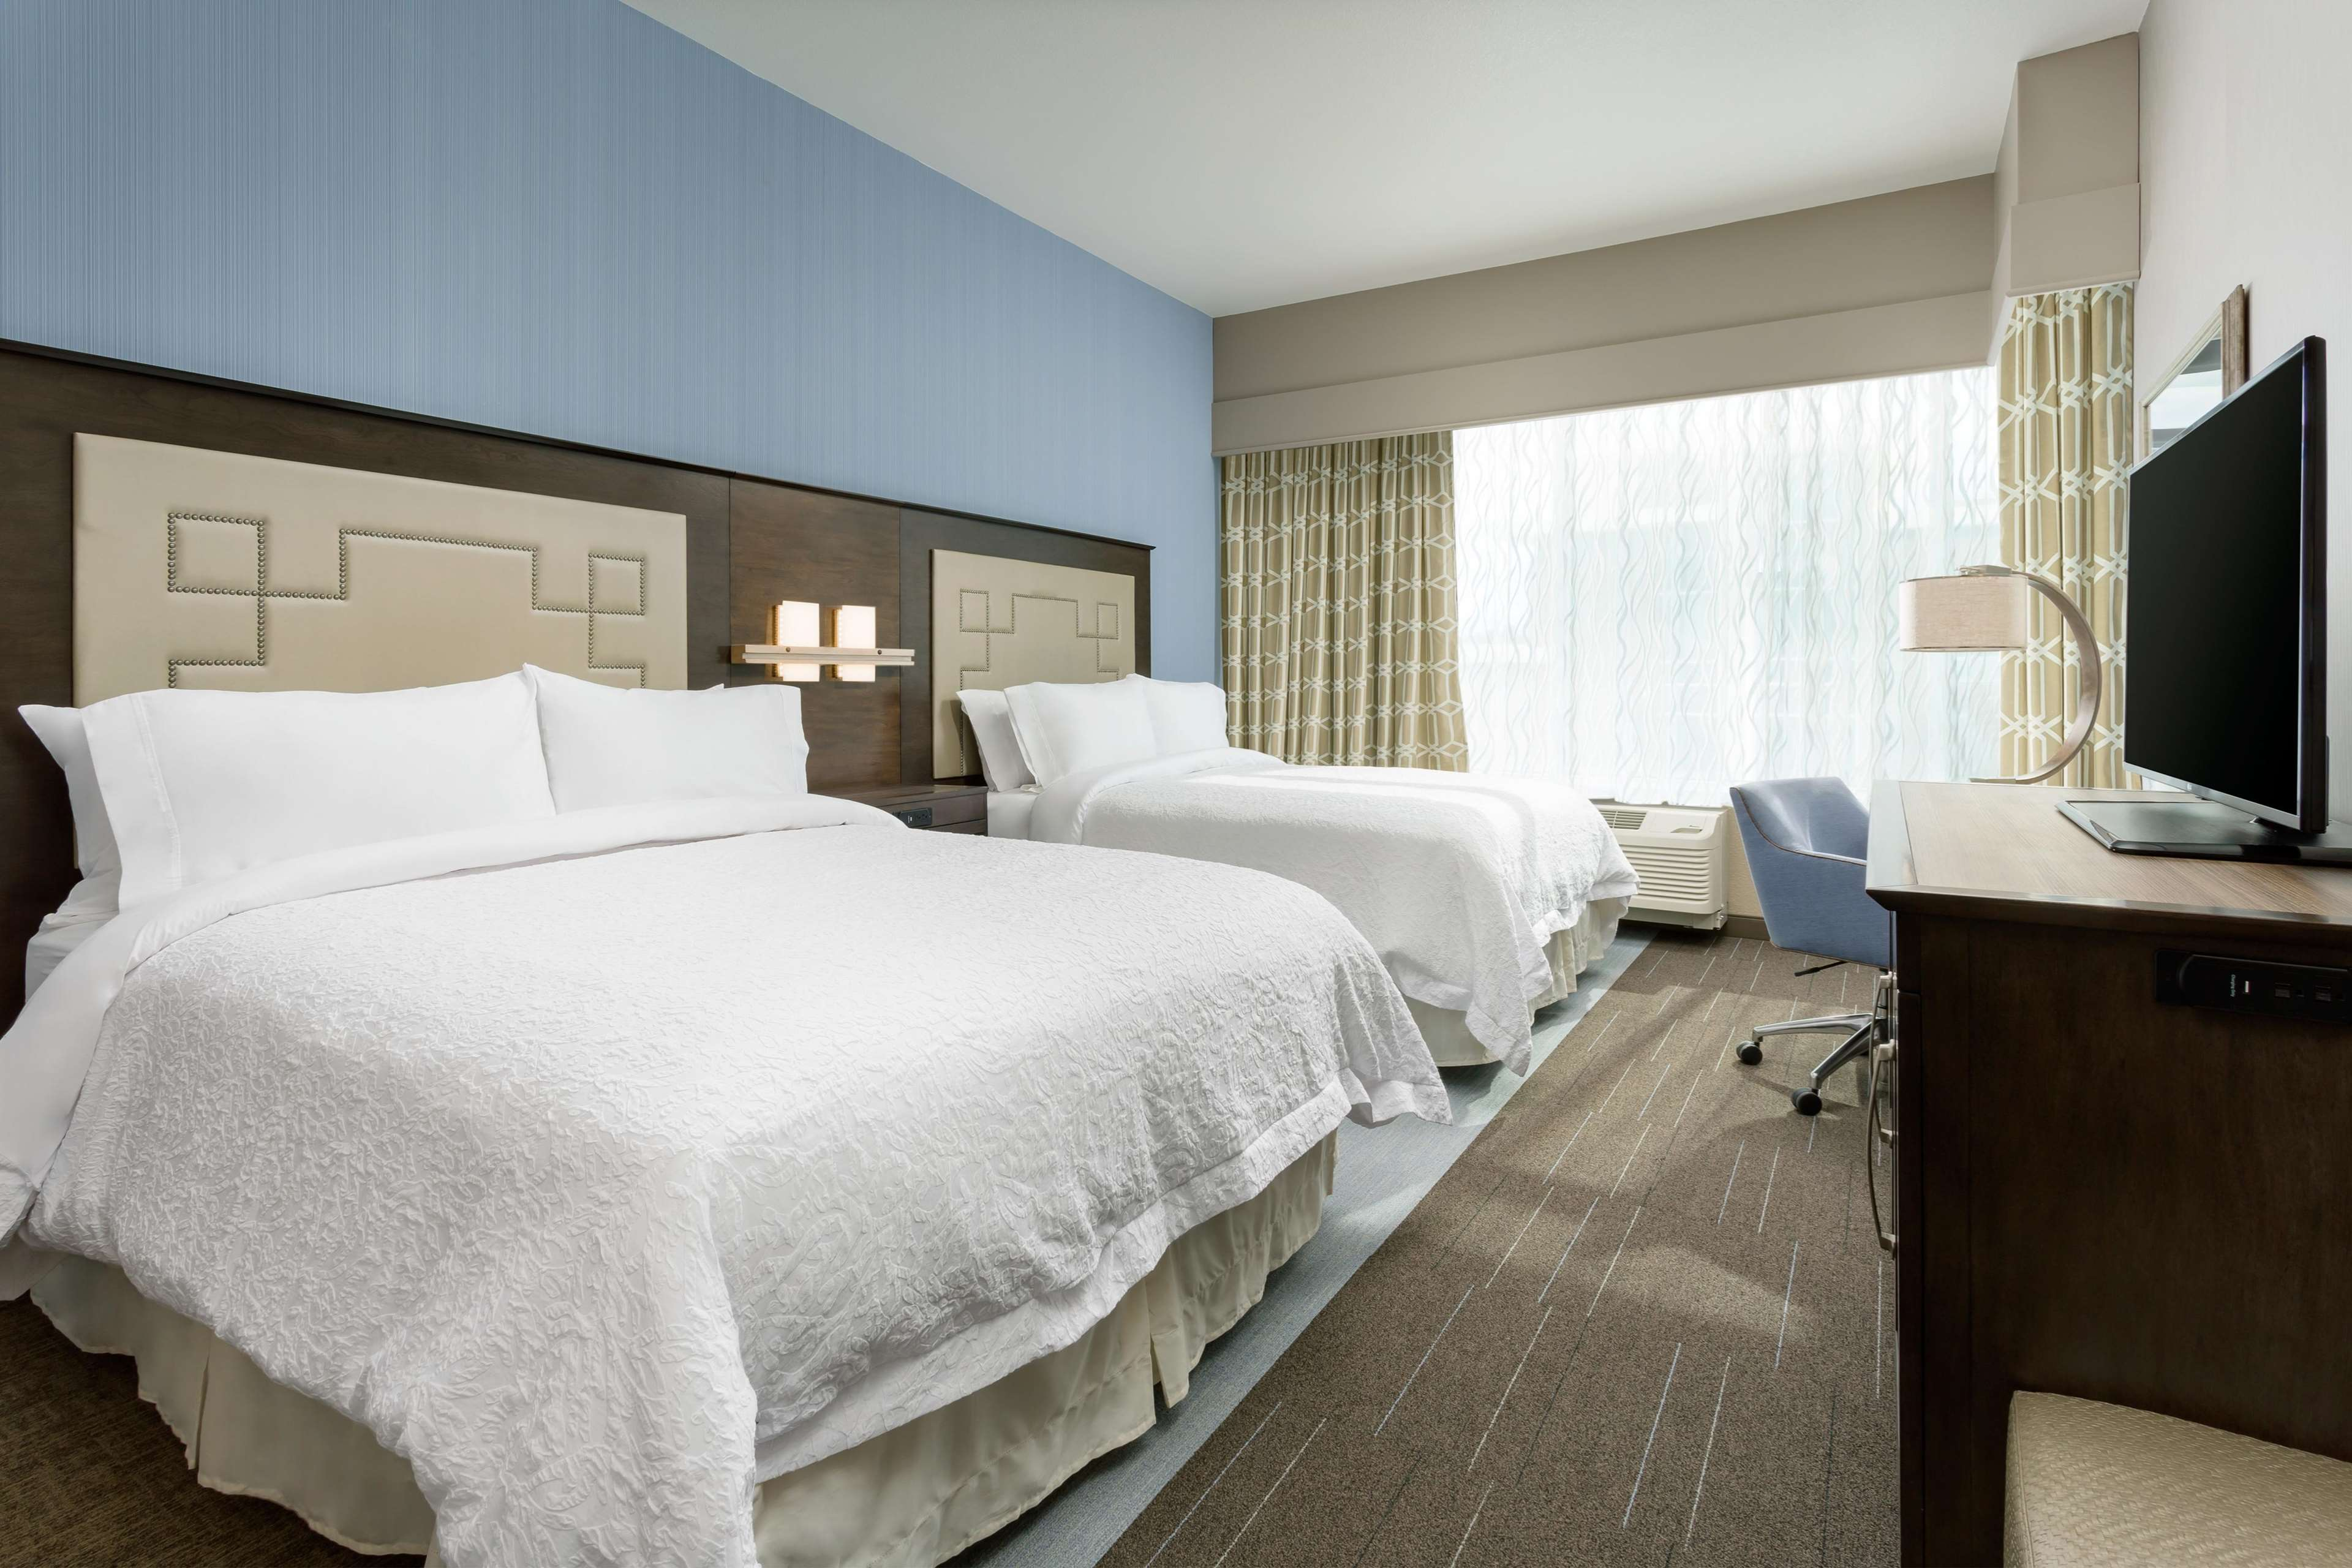 Hampton Inn & Suites Napa image 3